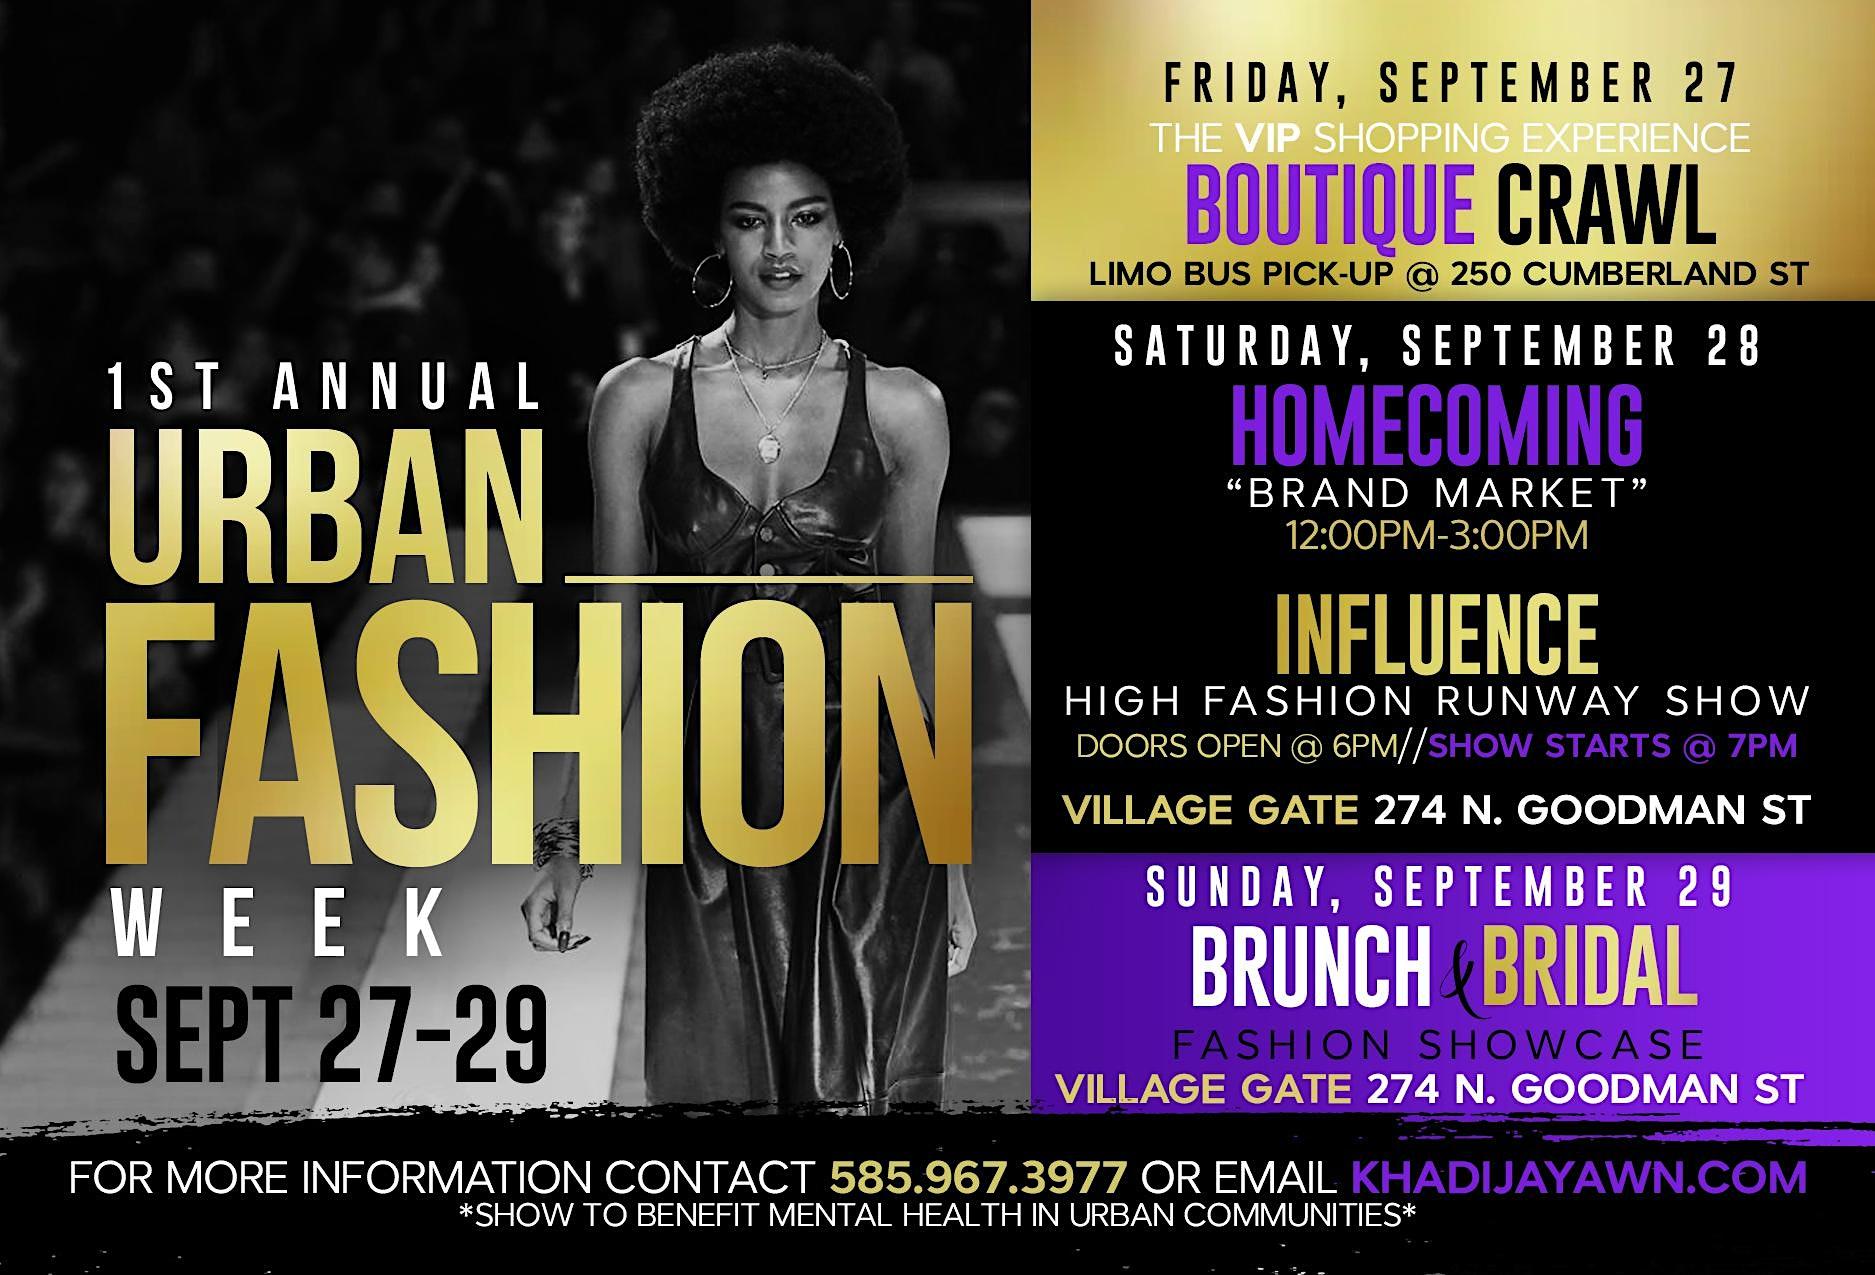 1st Annual Urban Fashion Weekend  Image